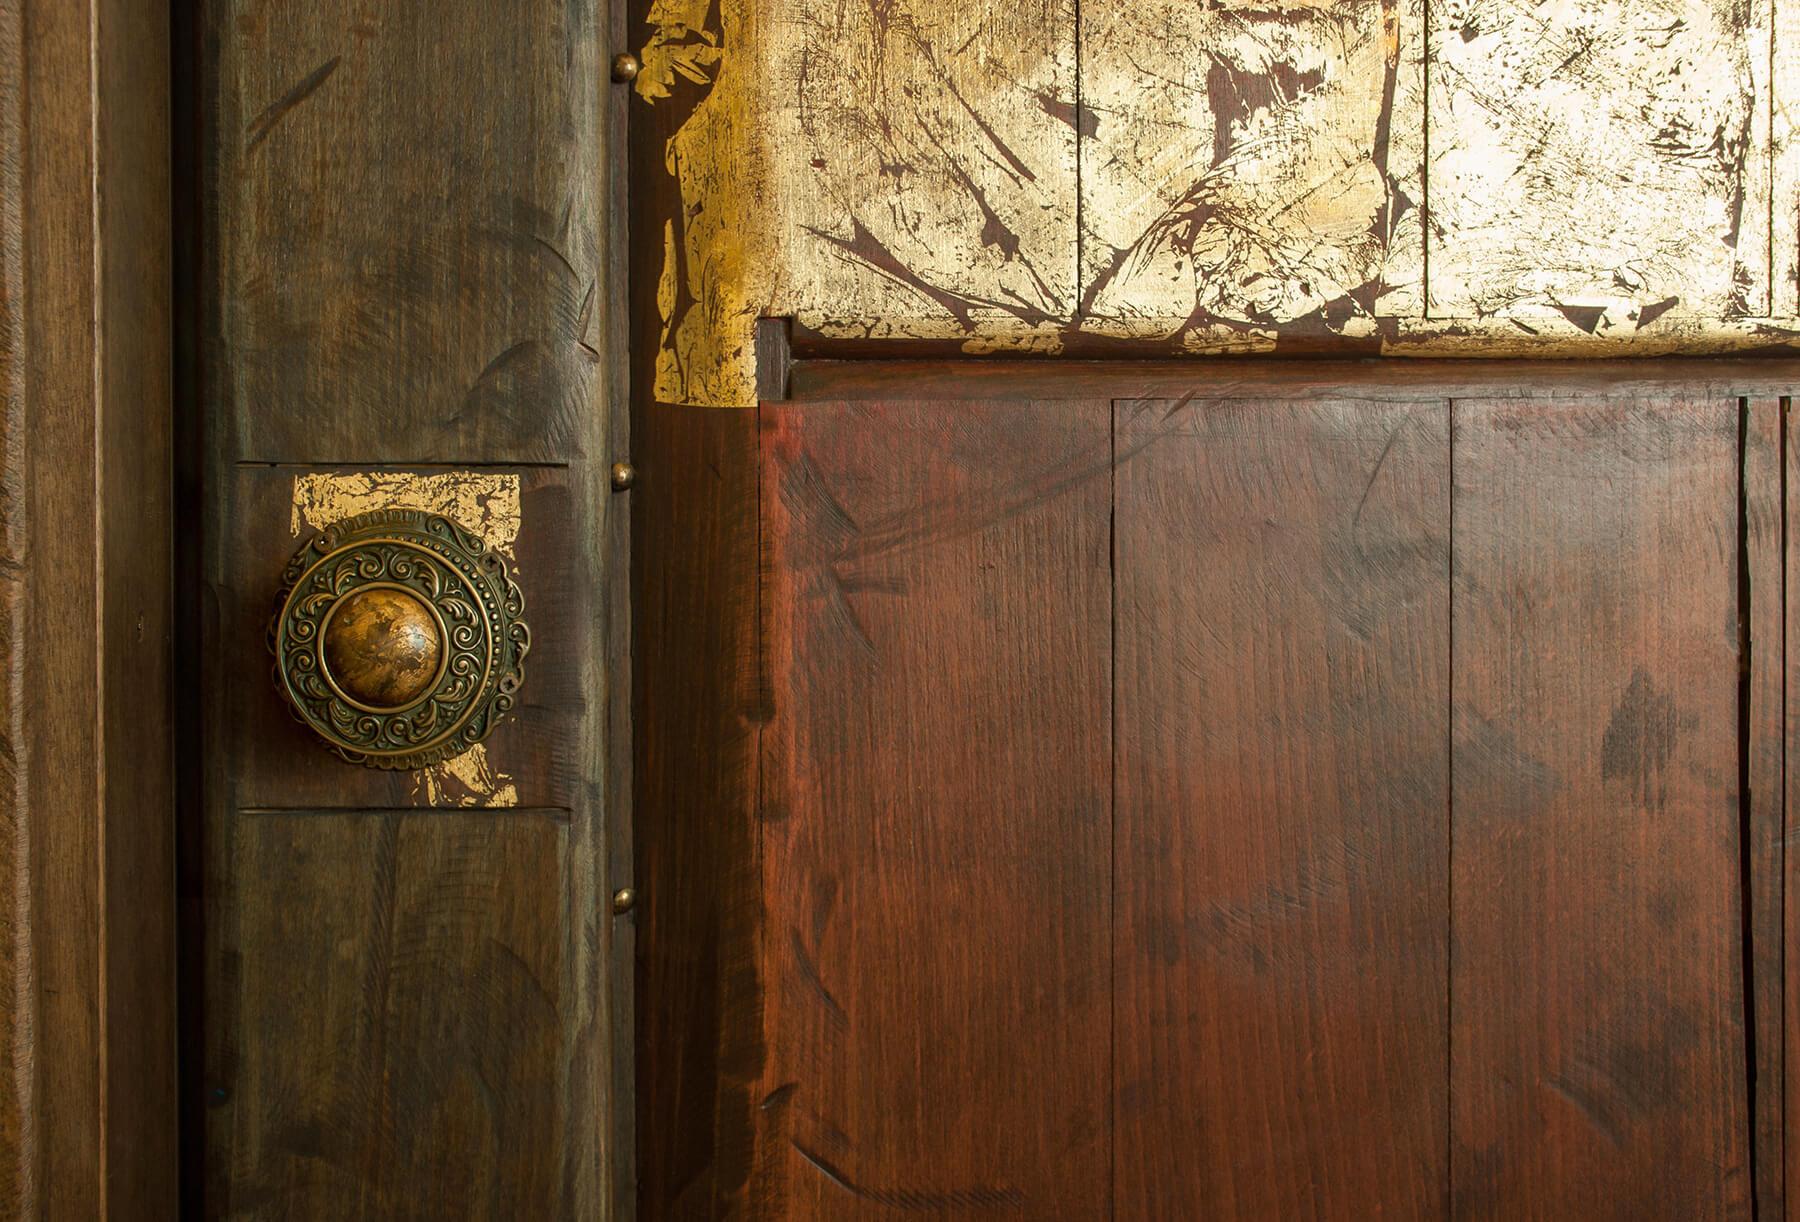 La porta dell'OM